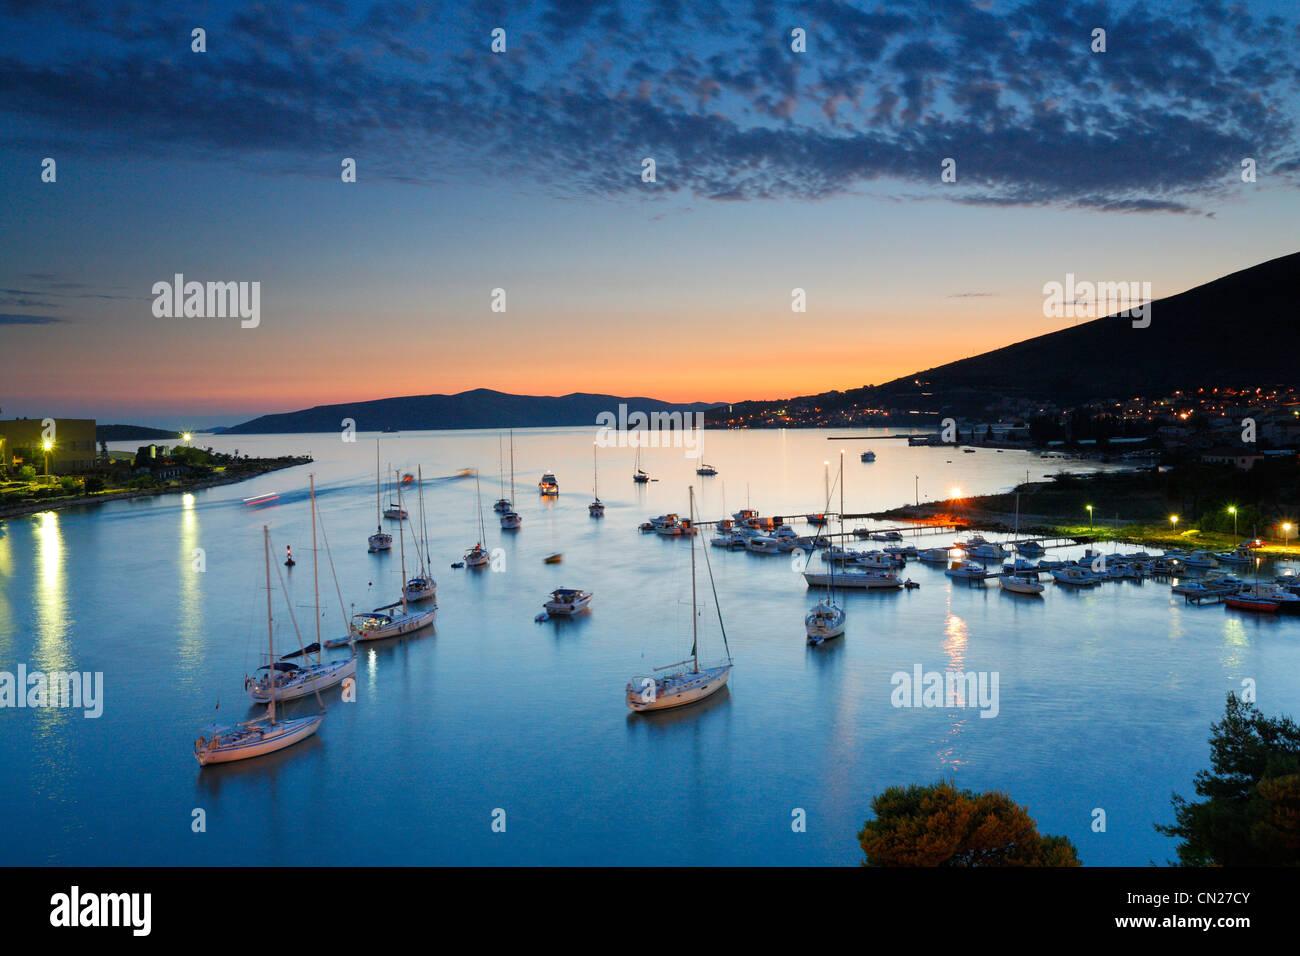 Segelboote Andocken von Altstadt Trogir in Dalmatien bei Sonnenuntergang. Stockbild